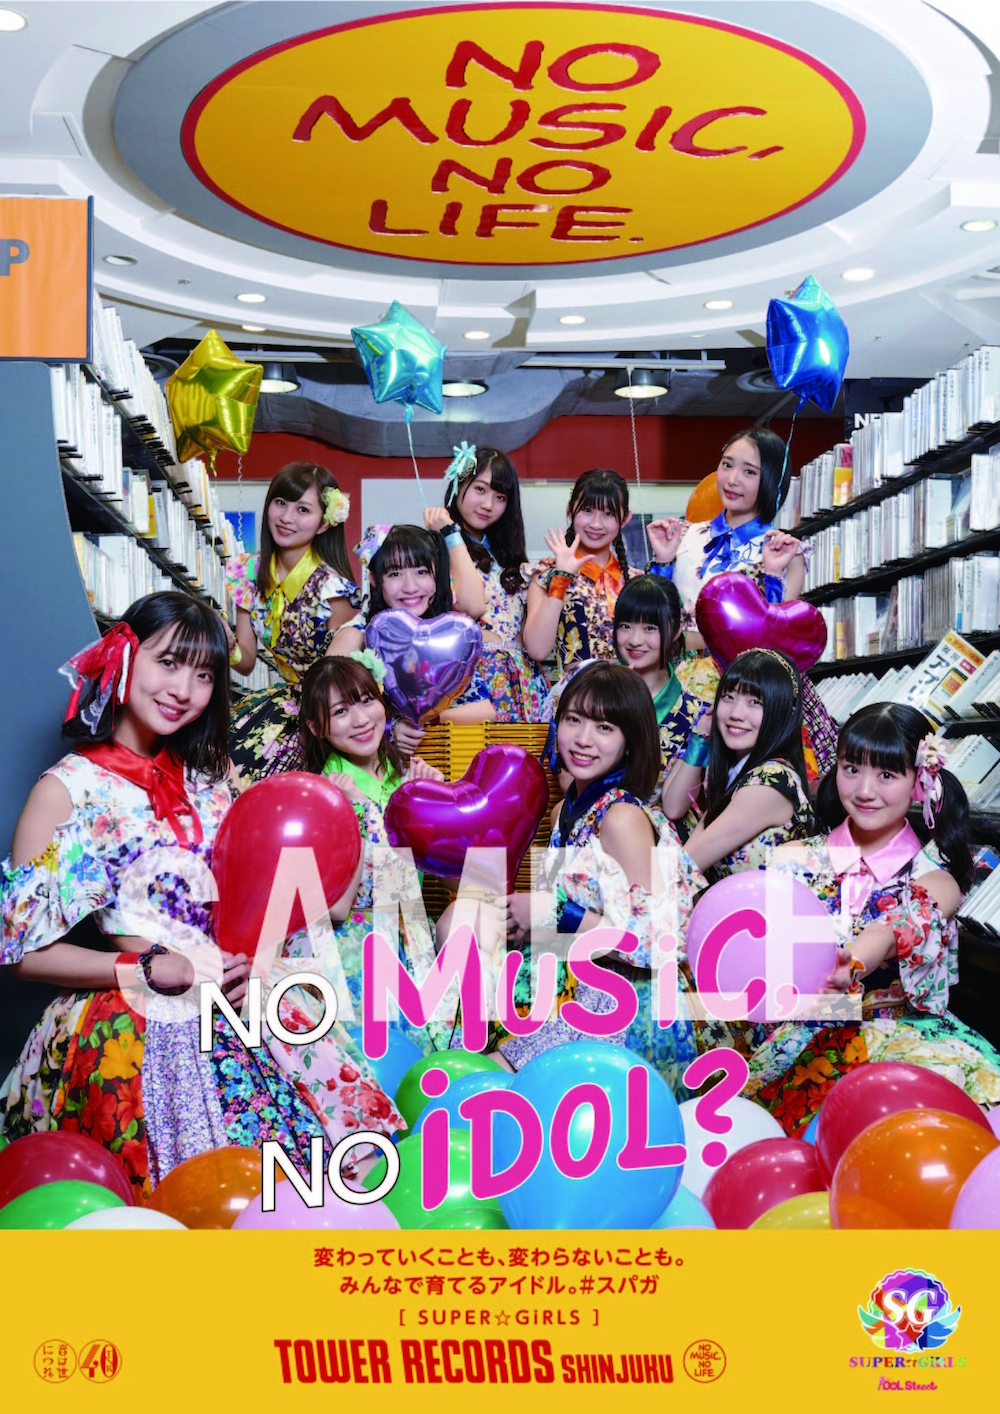 SUPER☆GiRLS・タワーレコード「NO MUSIC, NO IDOL?」コラボレーションポスター